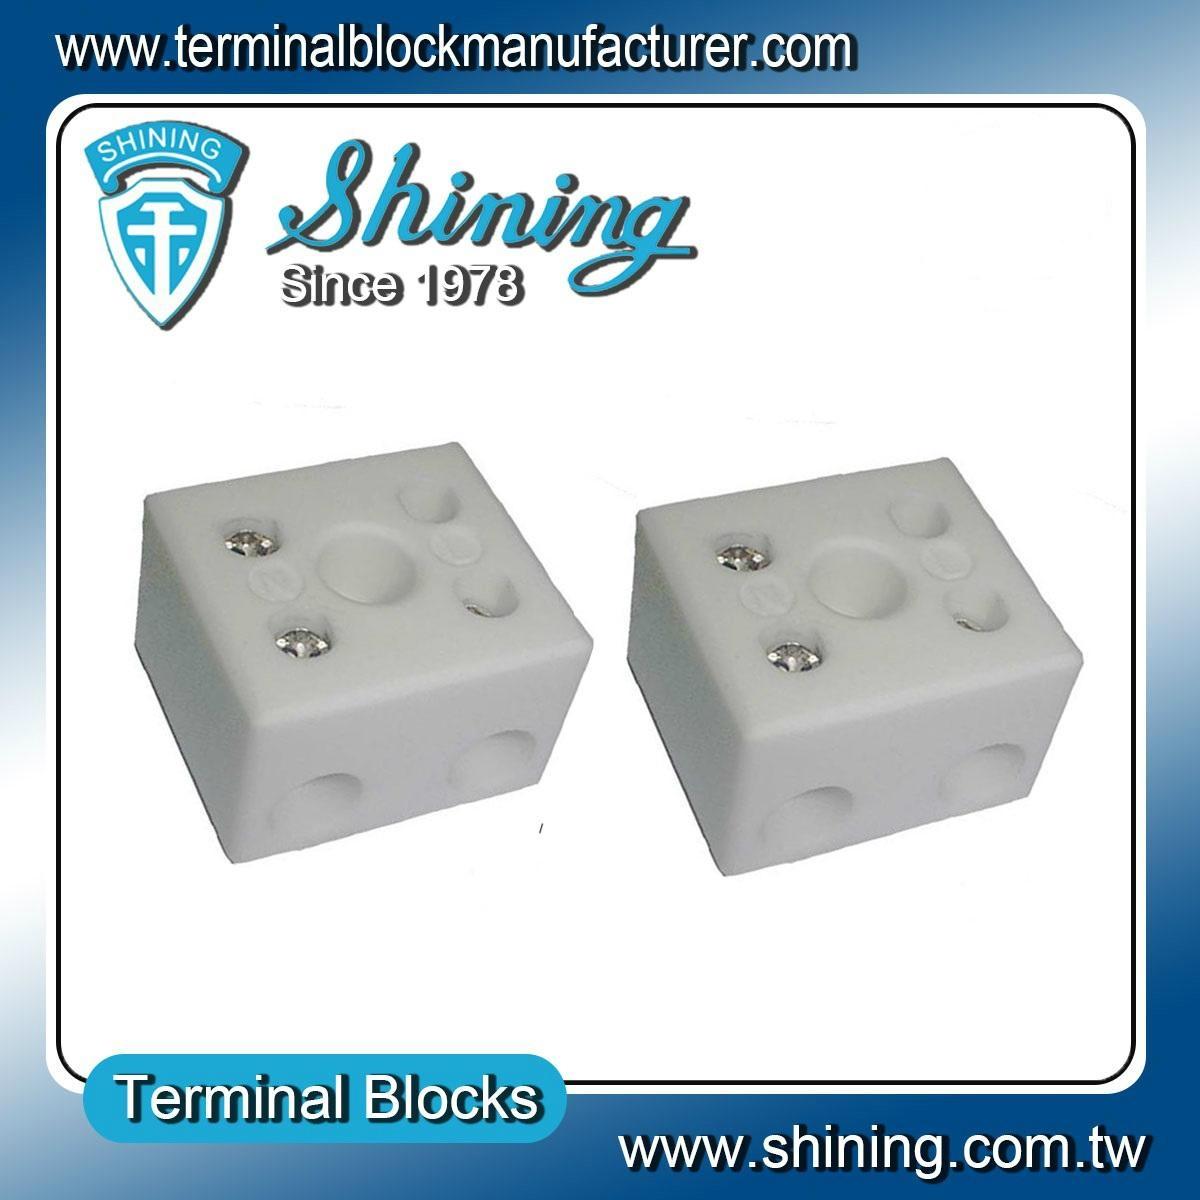 TC-652-A 陶瓷端子台 Ceramic Terminal Block 3